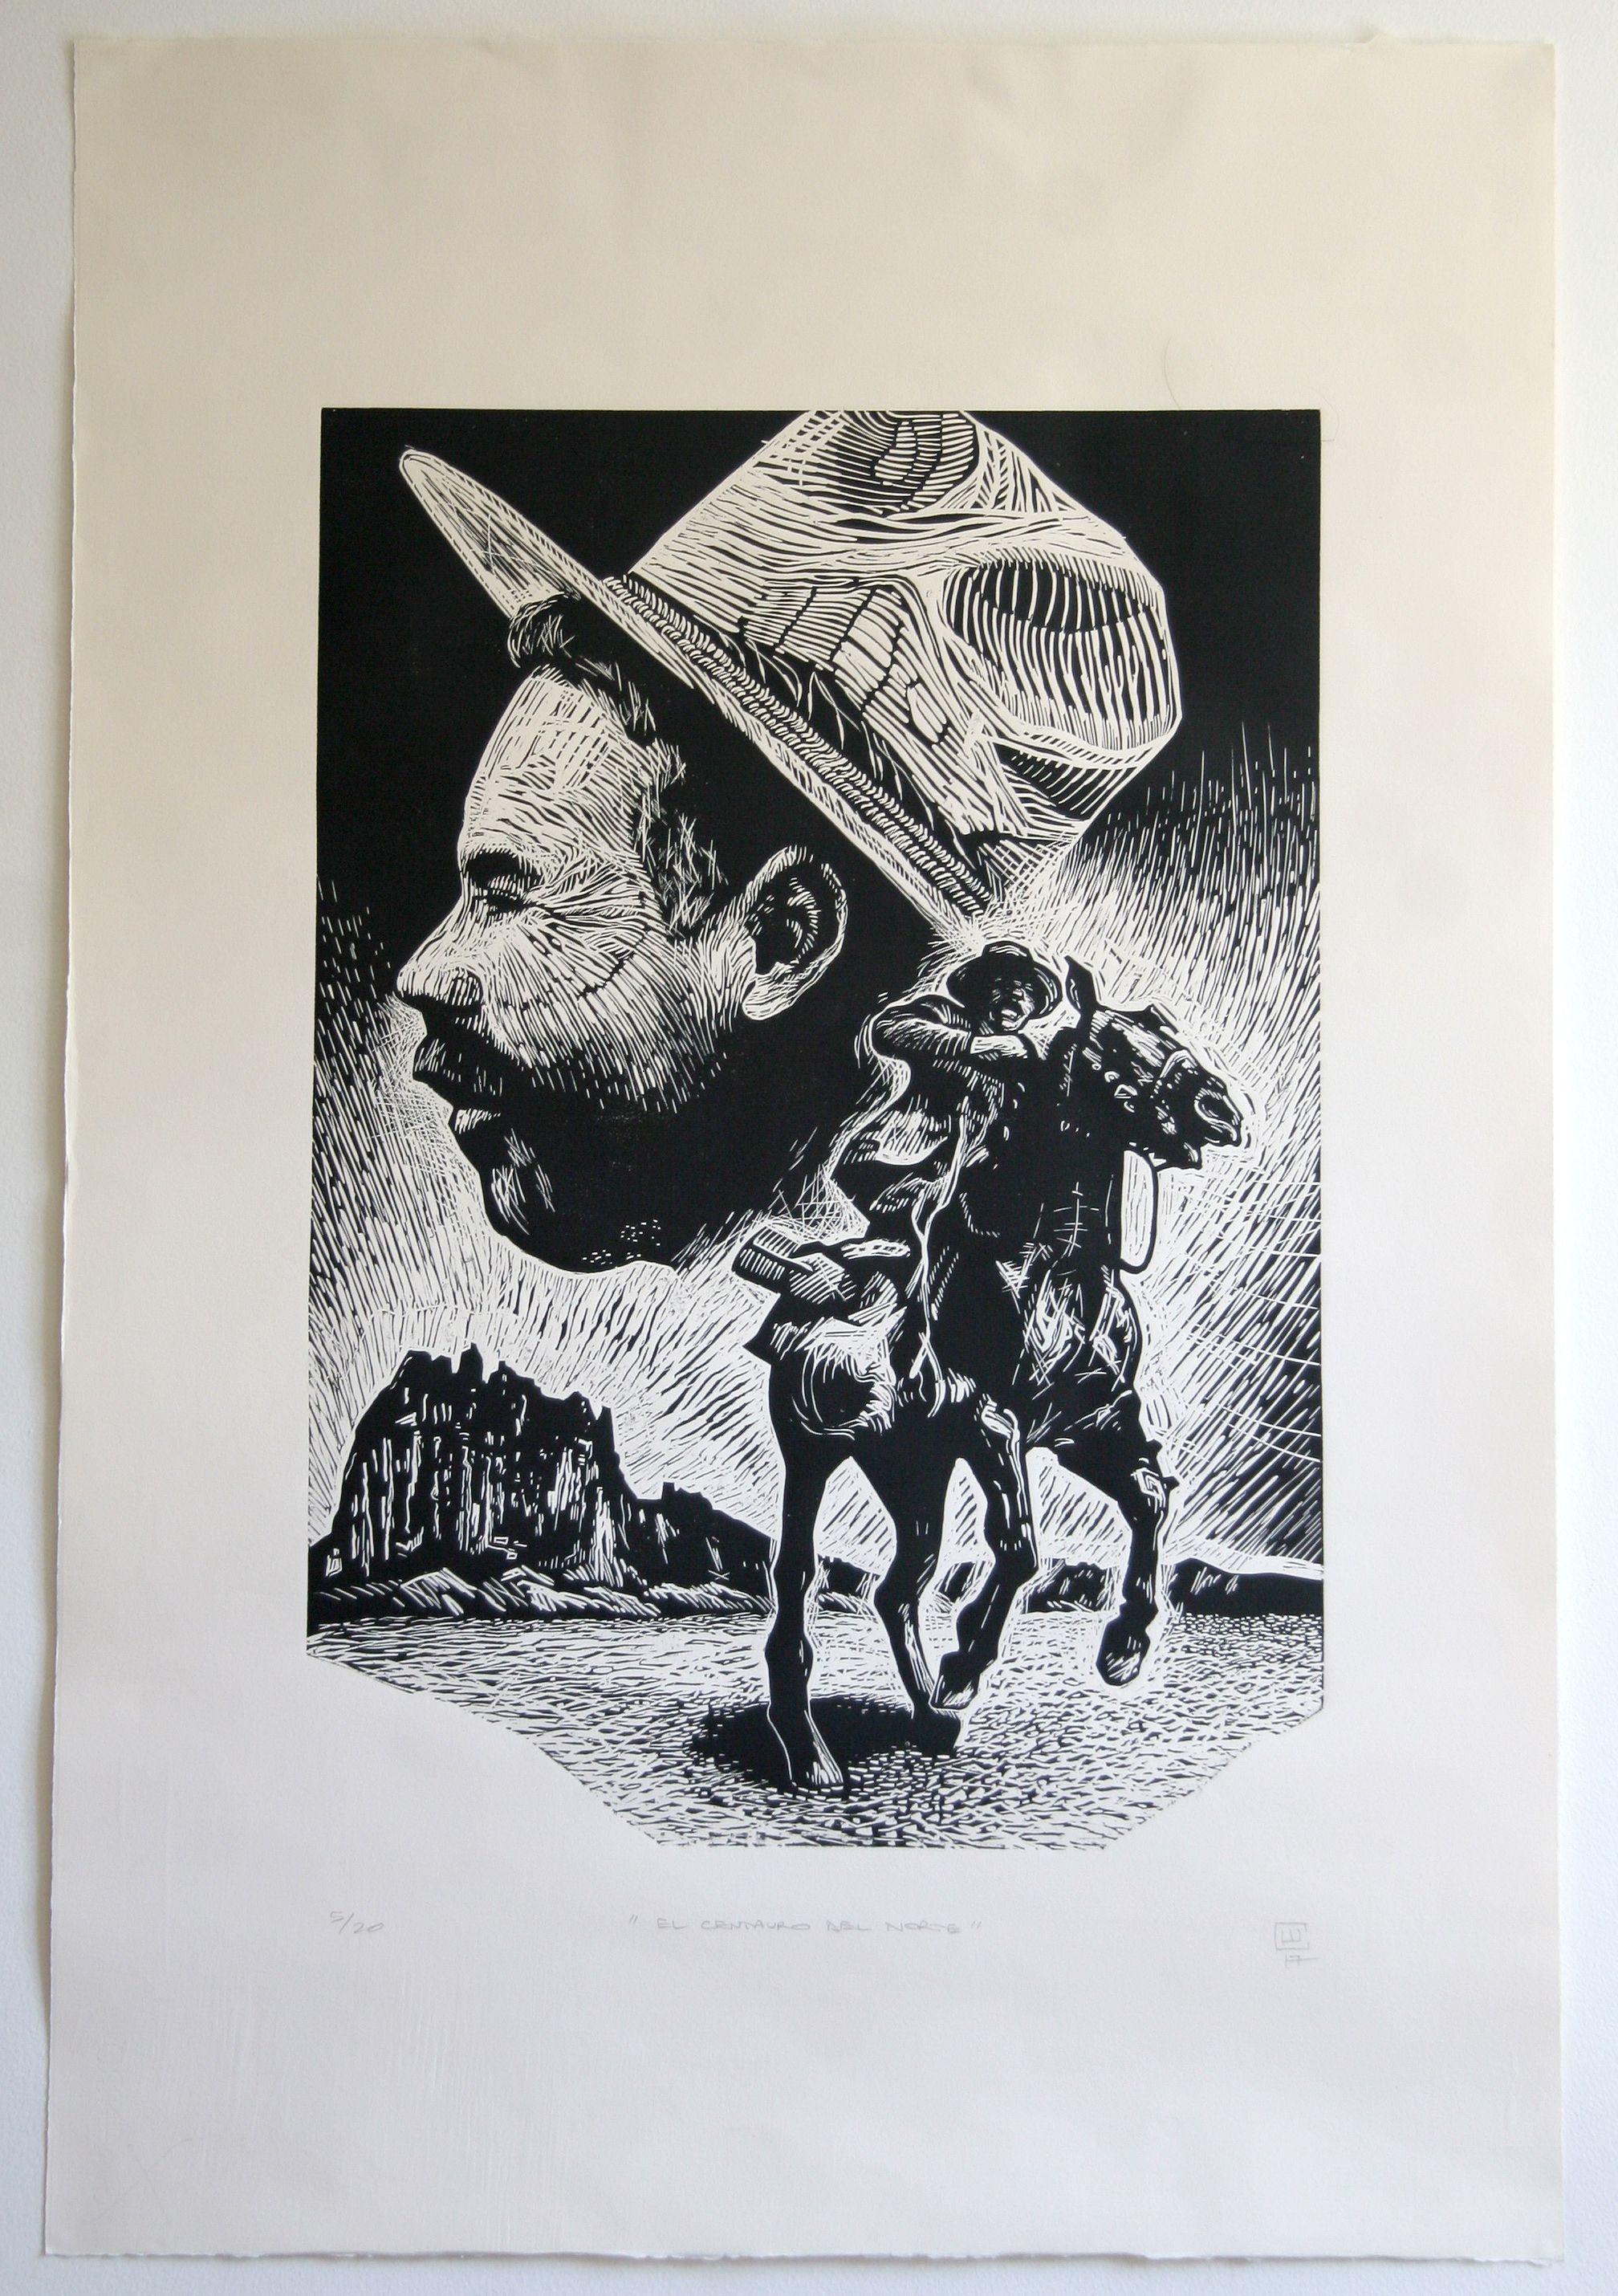 El Centauro Del Norte 2017 5 20 112x76cm A Linocut Portrait Of Pancho Villa Named The Centaur Of The North As H Pancho Villa El Centauro Del Norte Dibujos